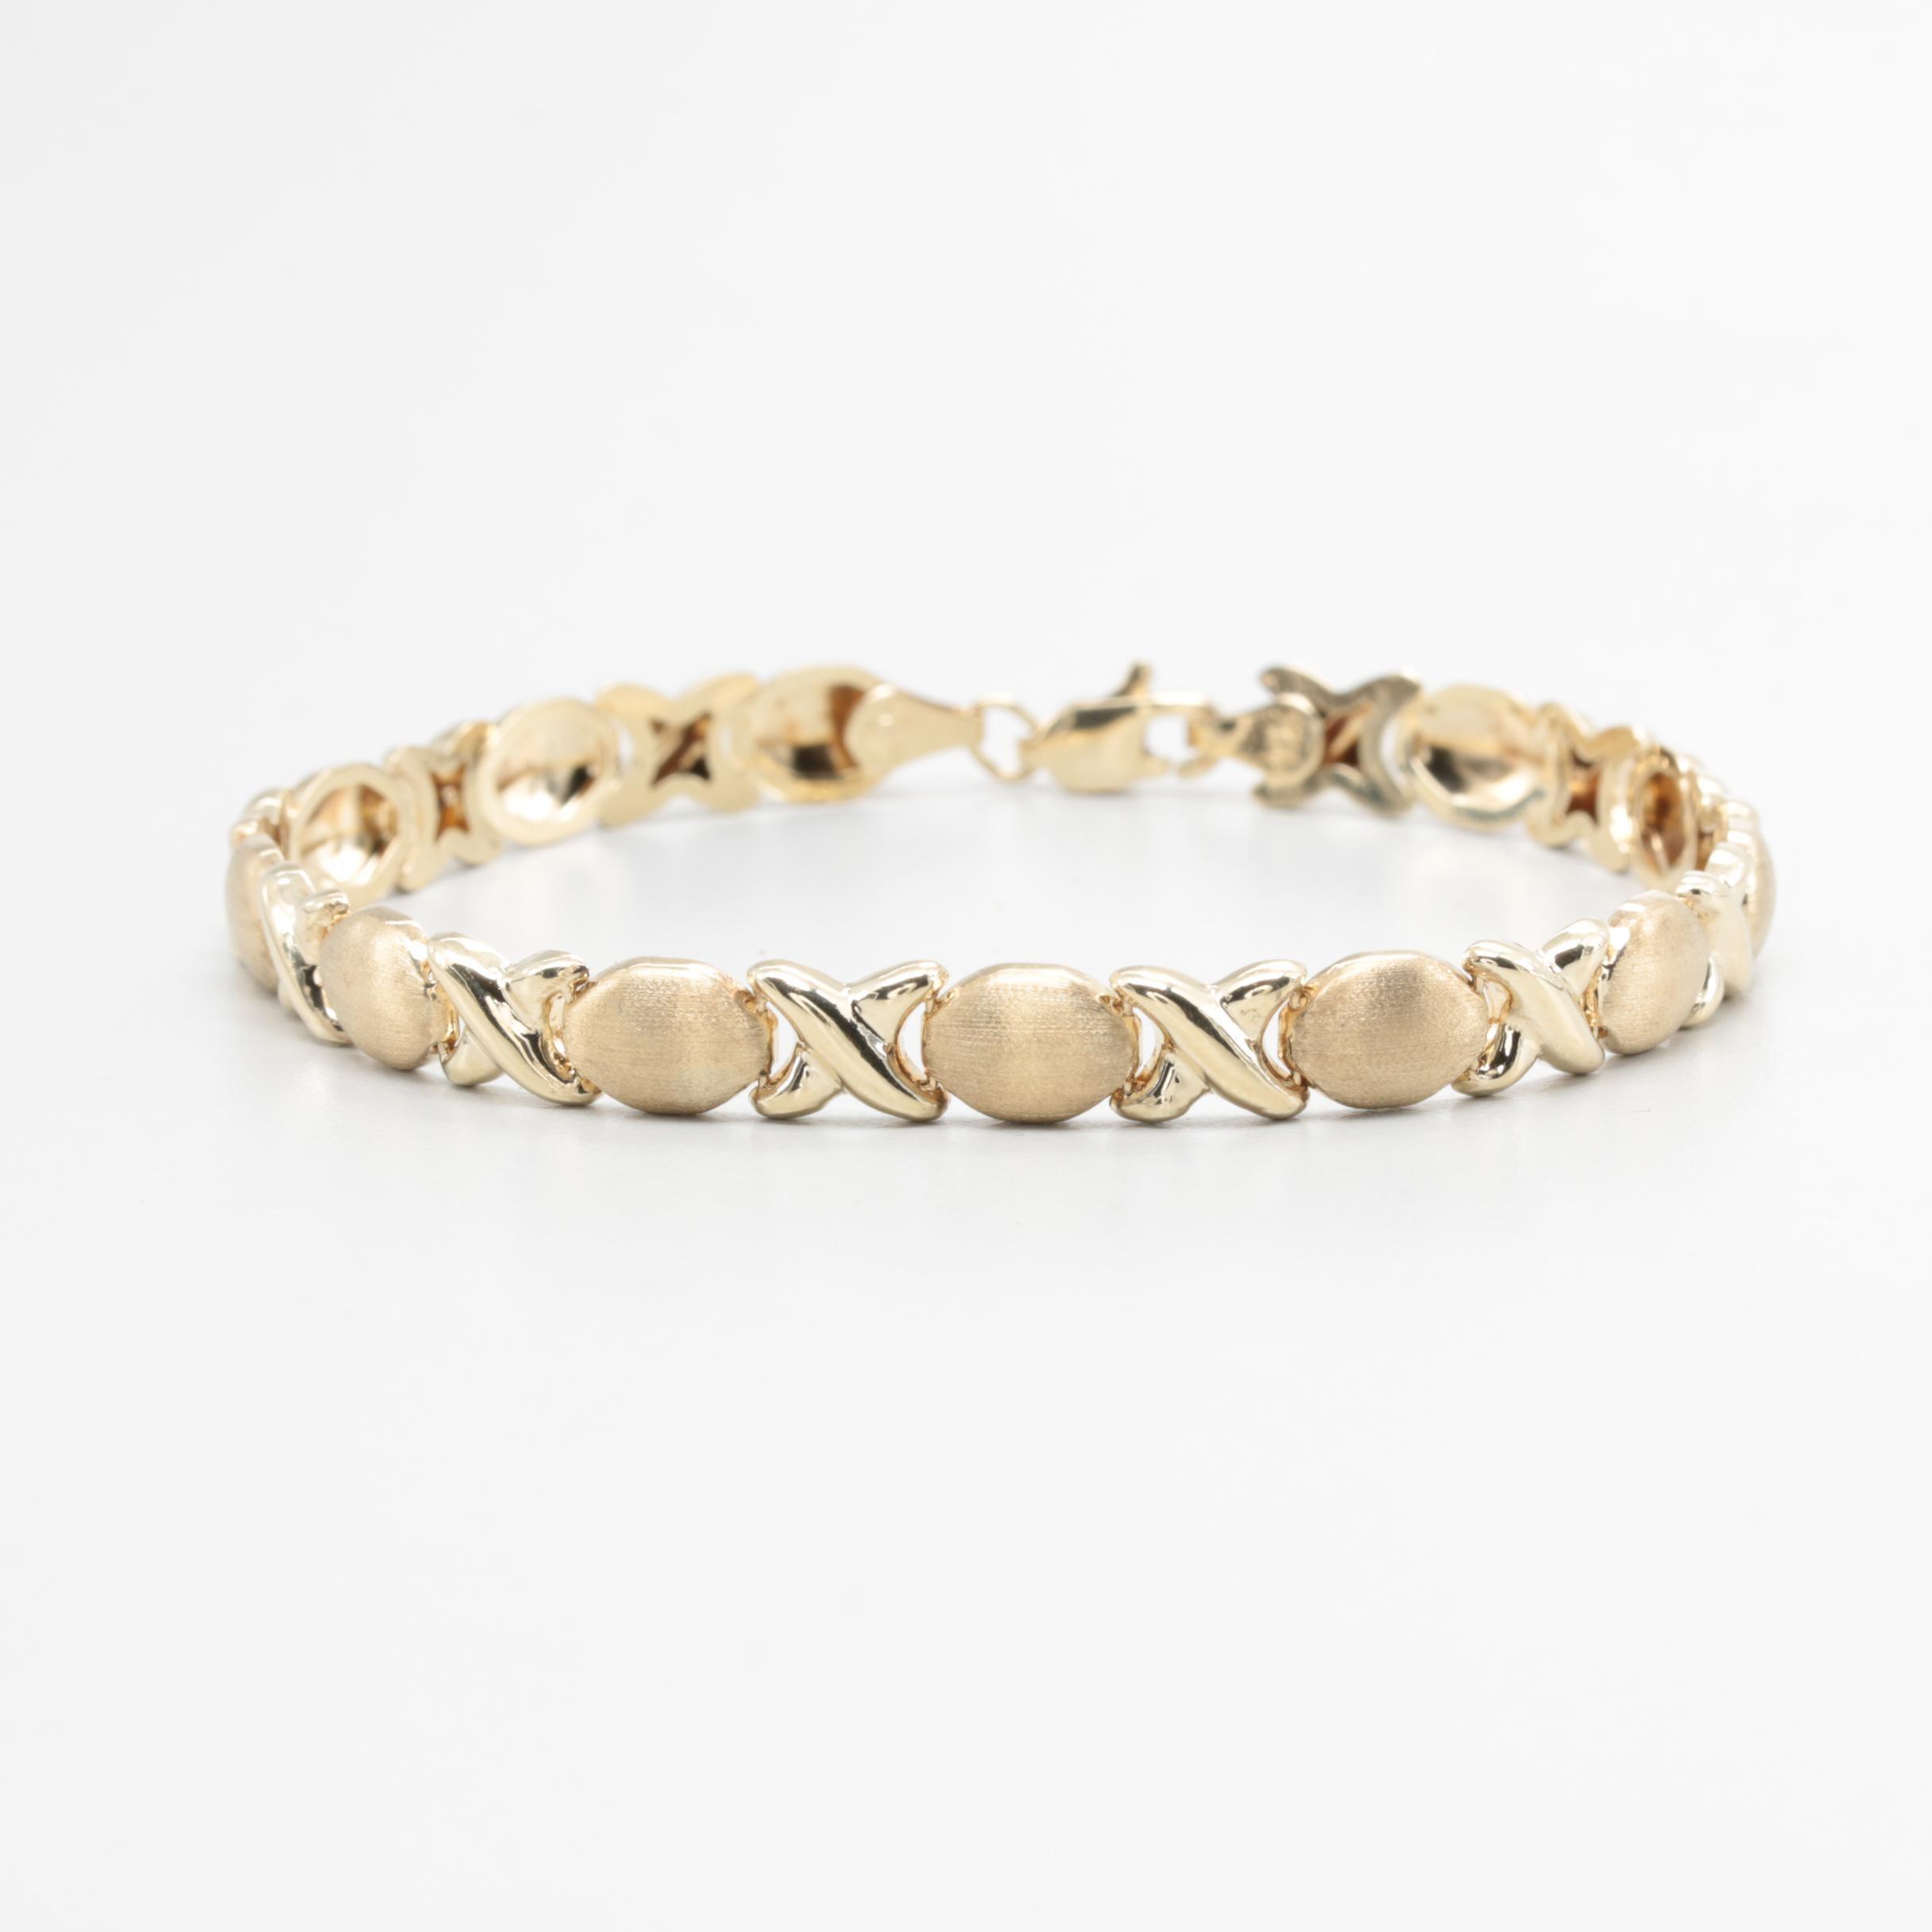 10K Yellow Gold Link Bracelet